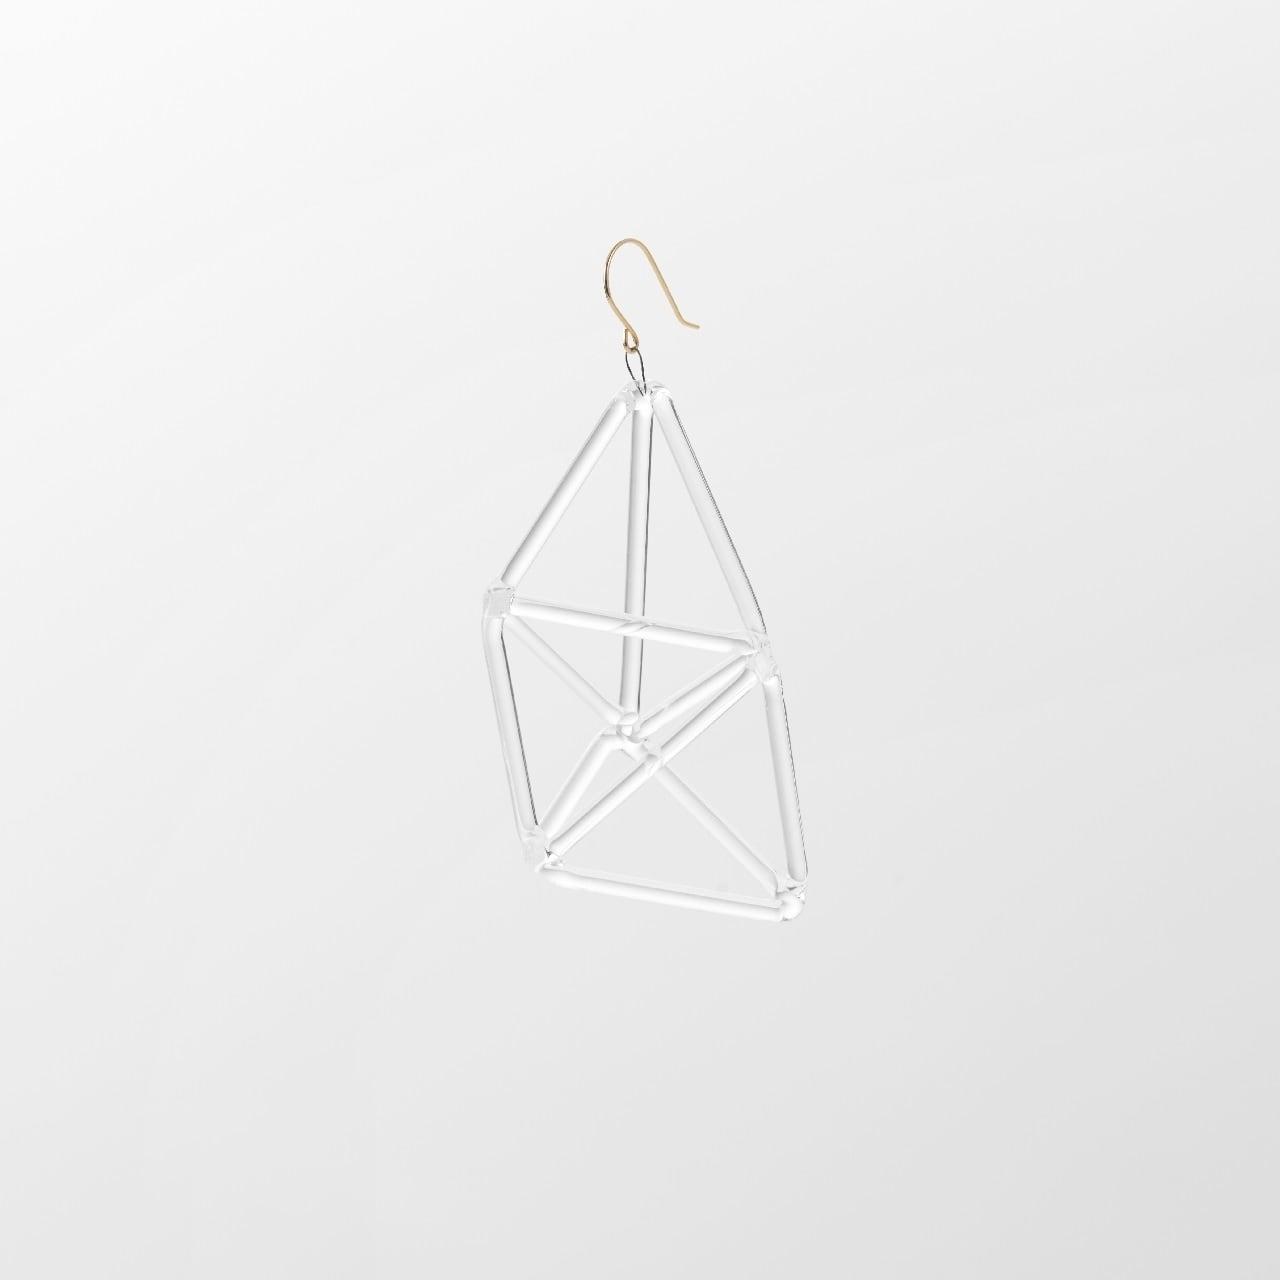 _cthruit シースルーイット triple triangle earring ピアス 【Clear】